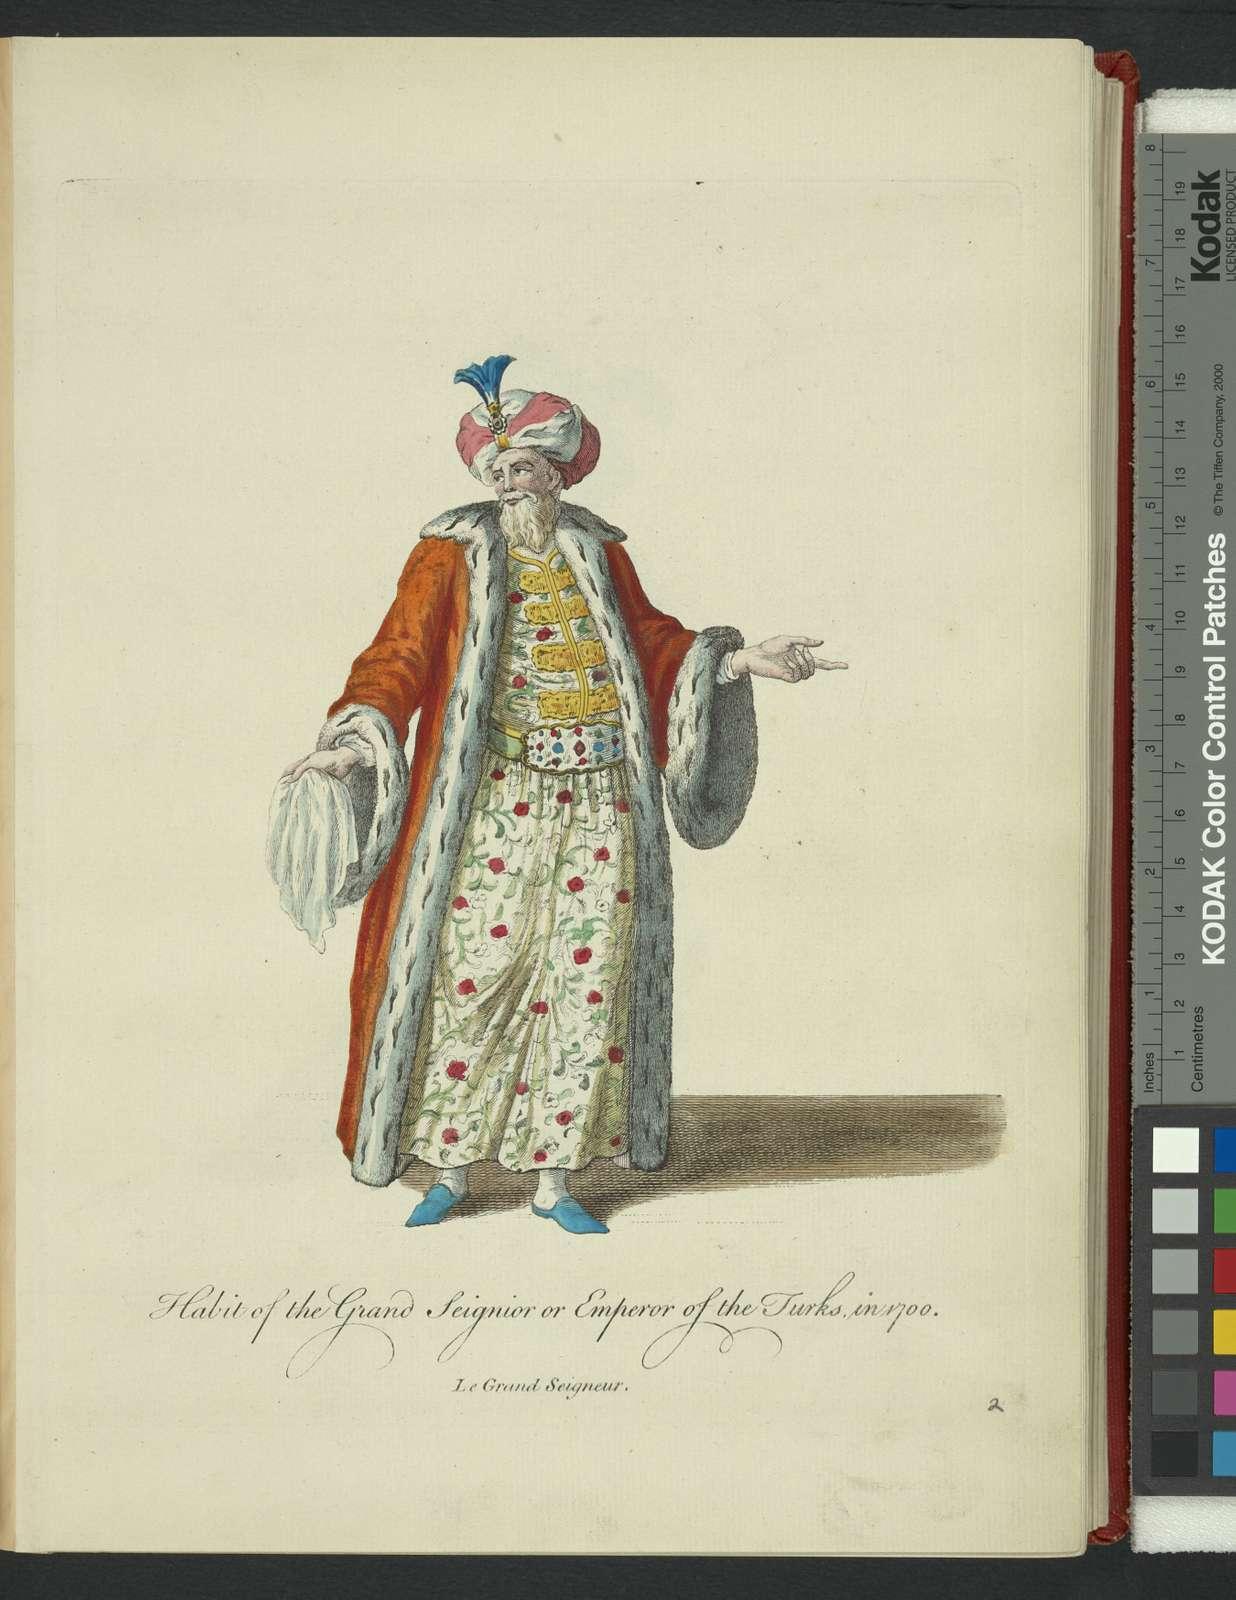 Habit of the grand seignior or emperor of the Turks in 1700. Le grand seignior.